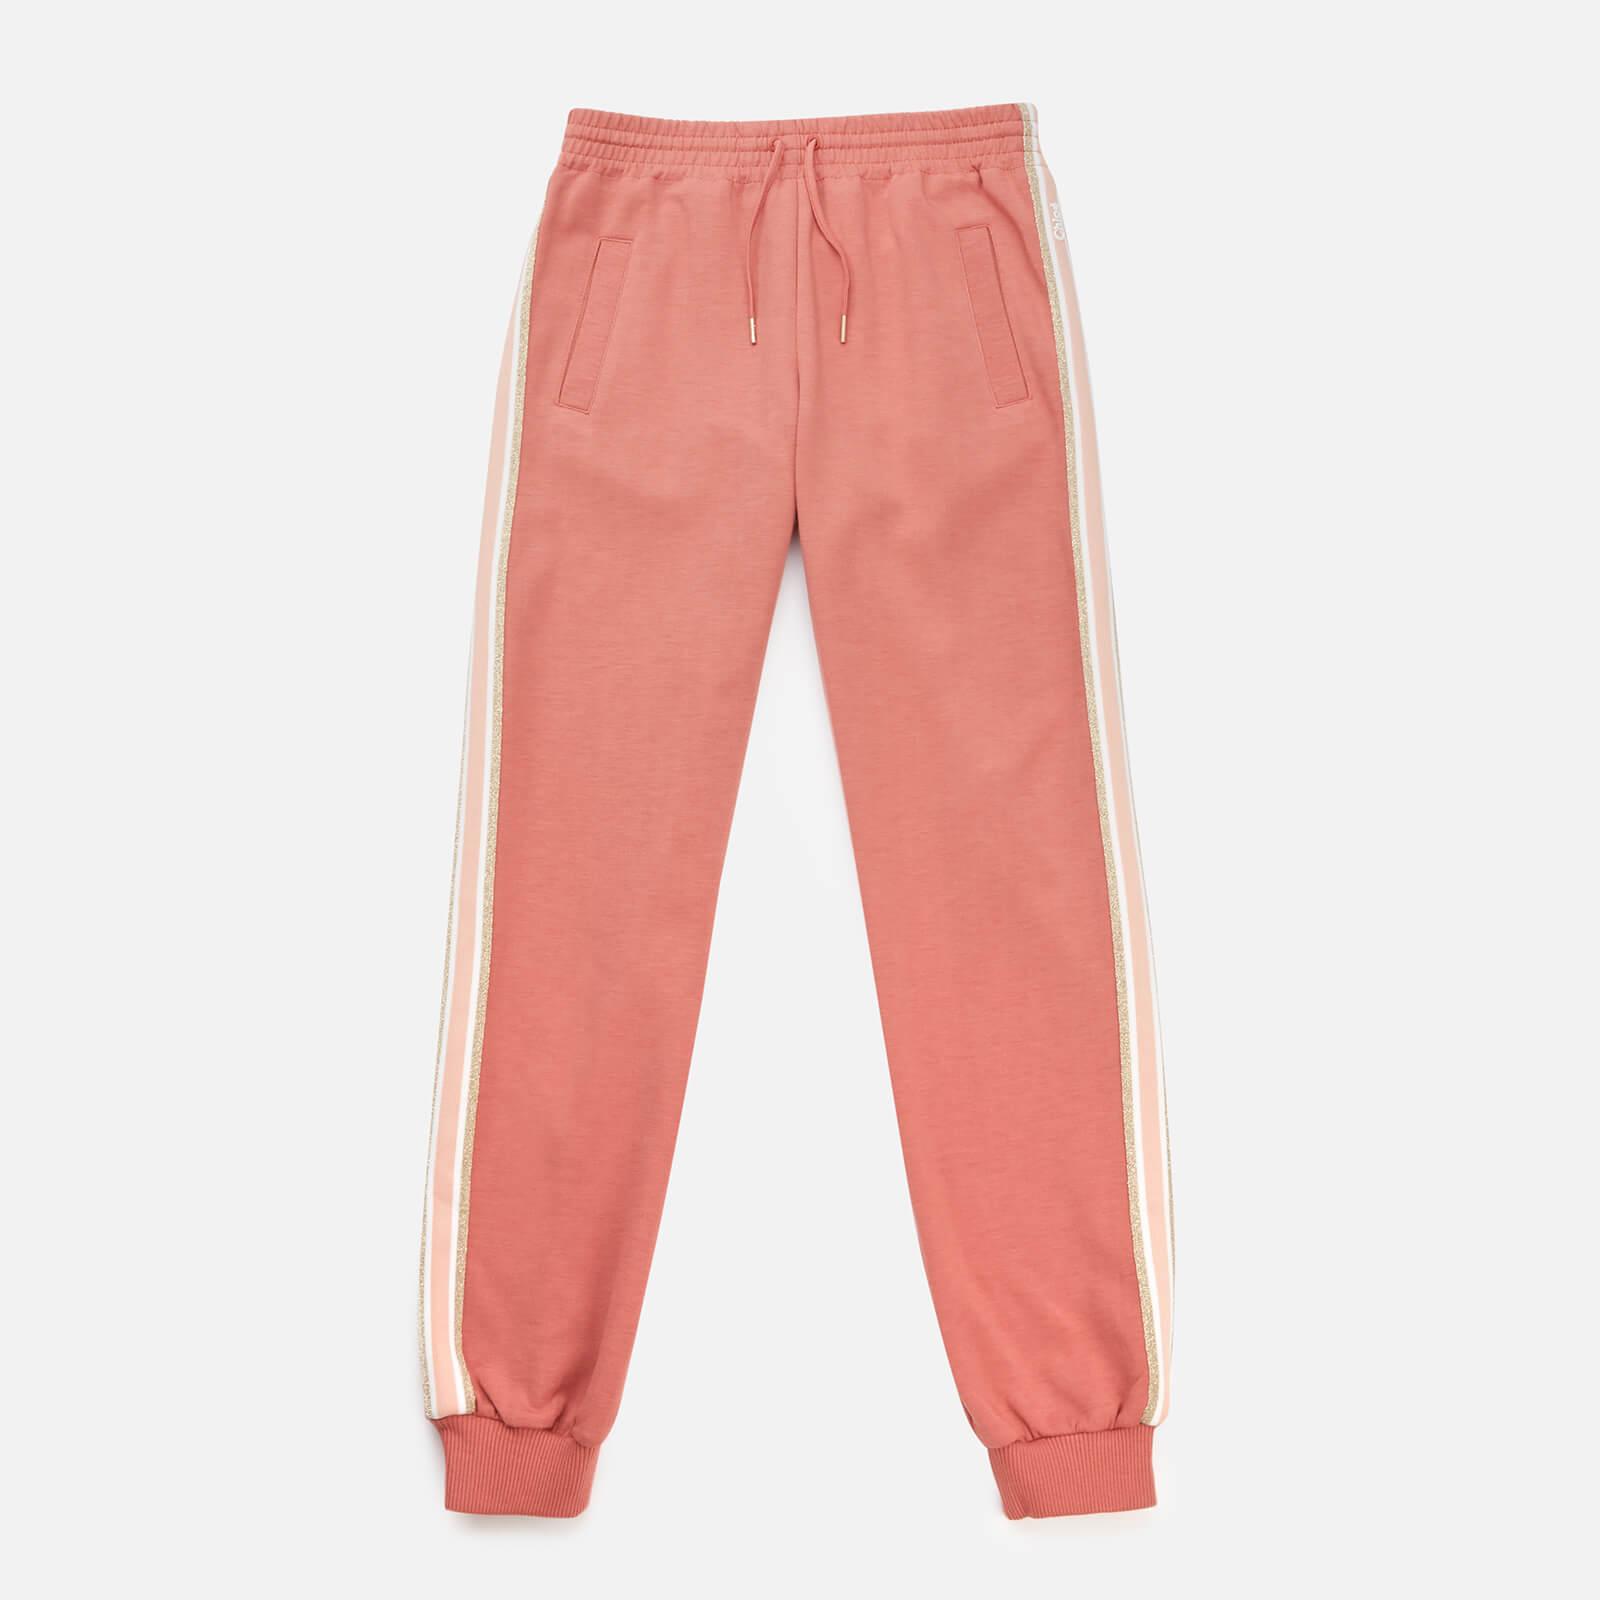 Chloe Girls' Sweatpant Trousers - Brick - 6 Years